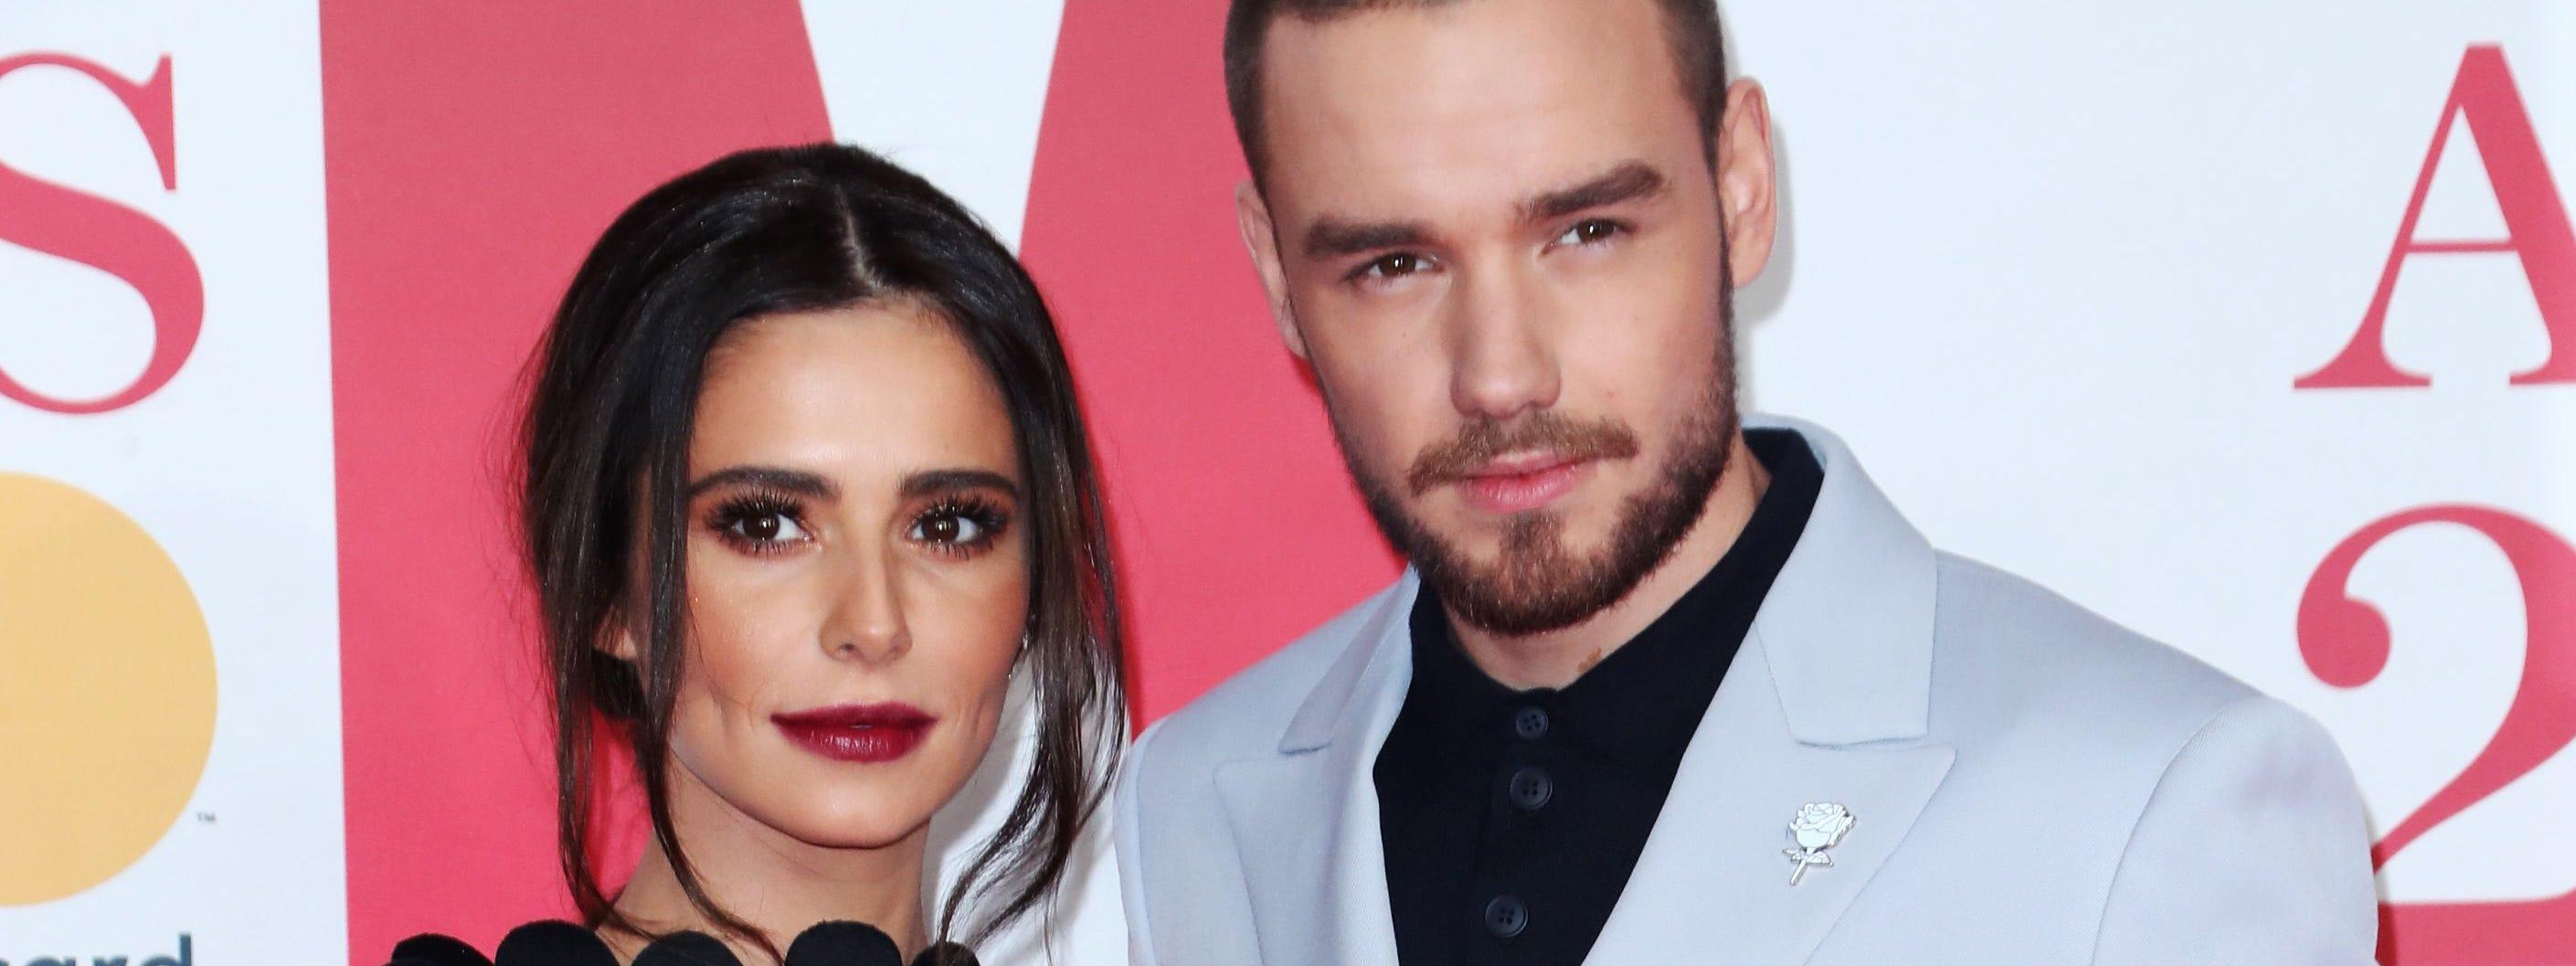 Cheryl Cole And Liam Payne Split